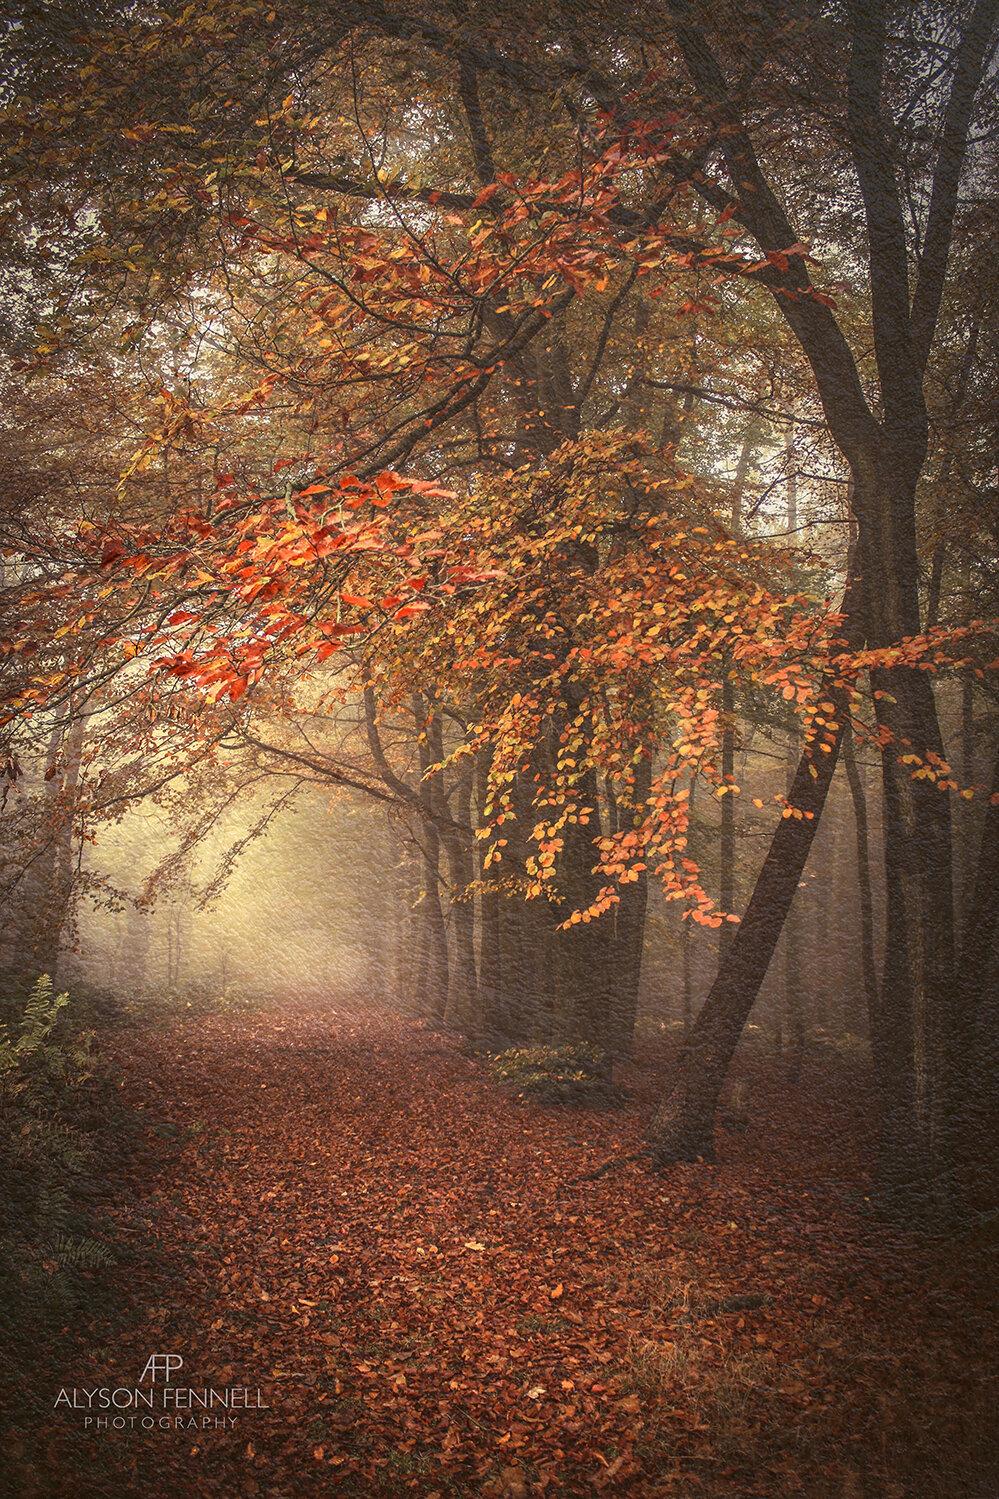 Autumnal Misty Woodland